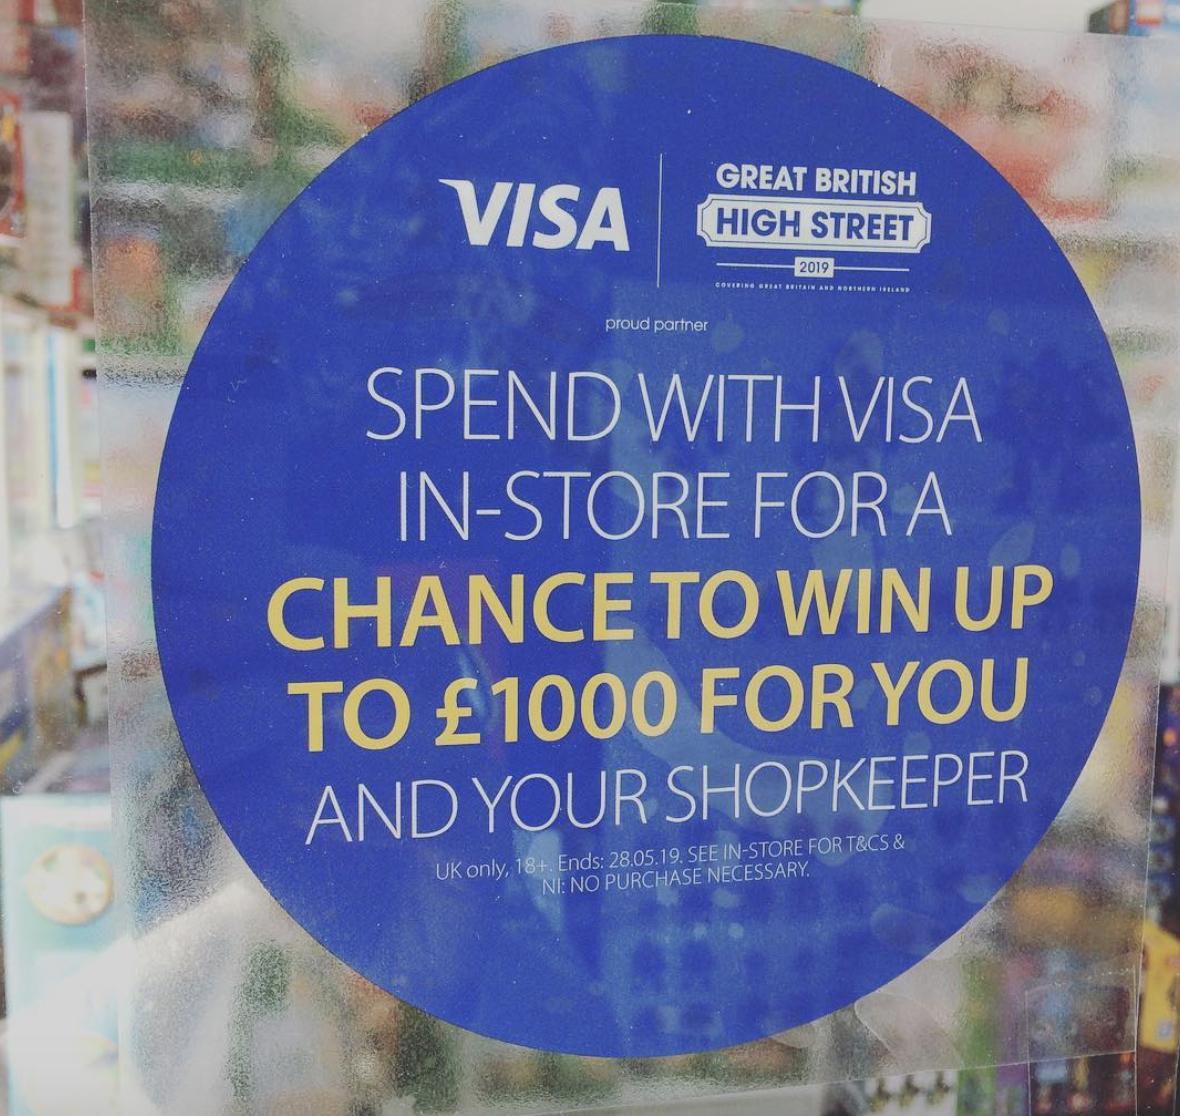 Visa Great British High Street promotion